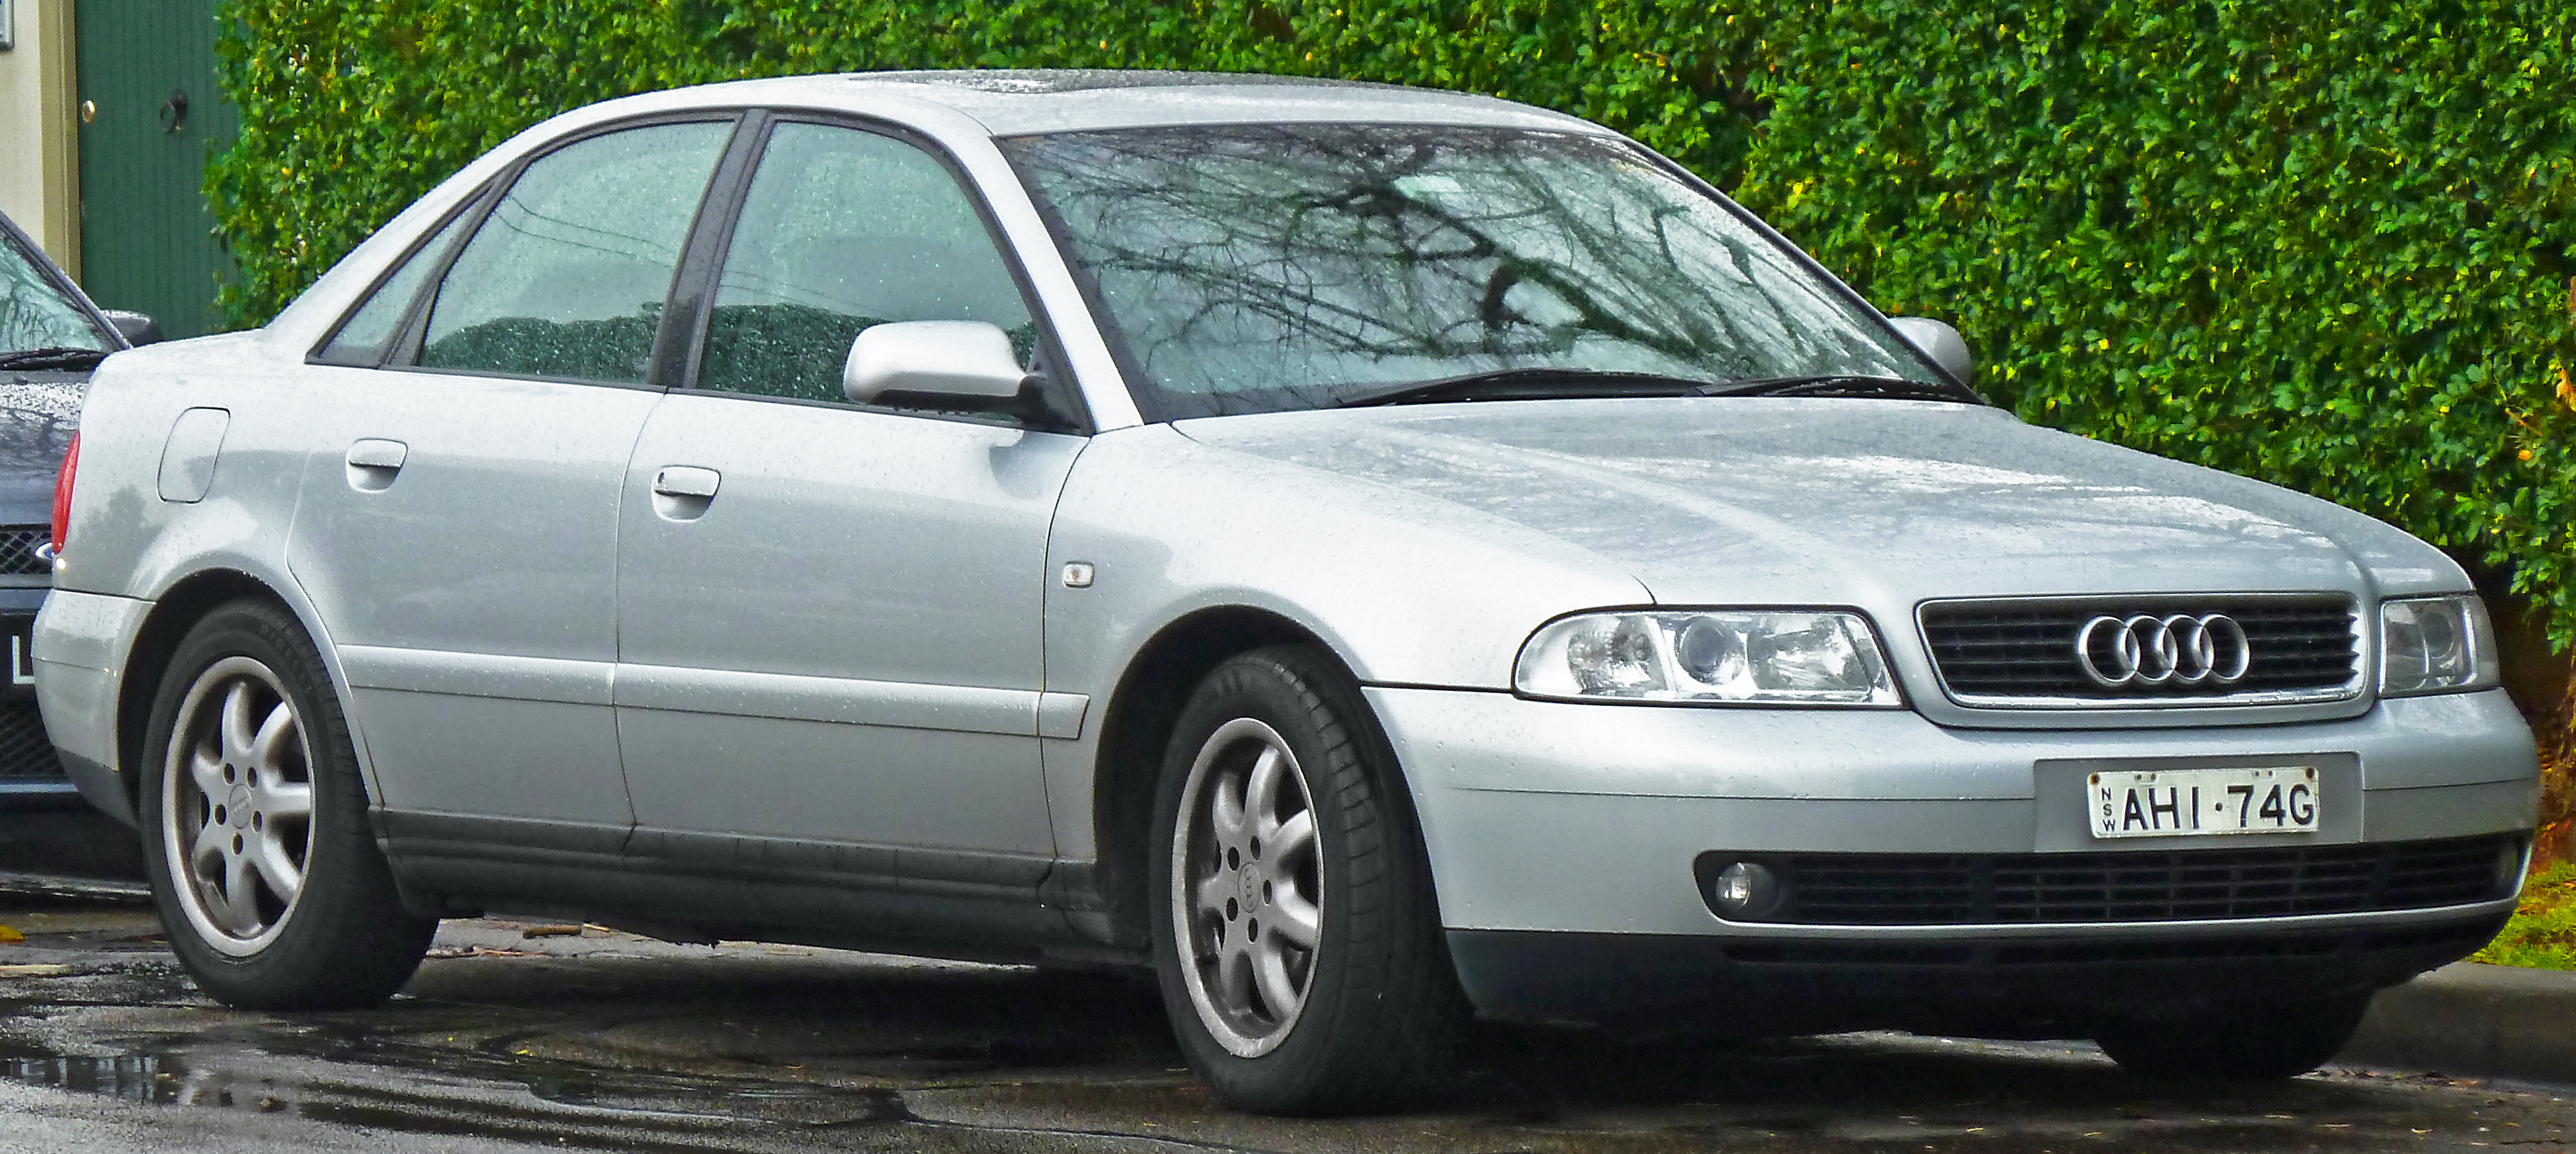 Kelebihan Audi 1999 Murah Berkualitas